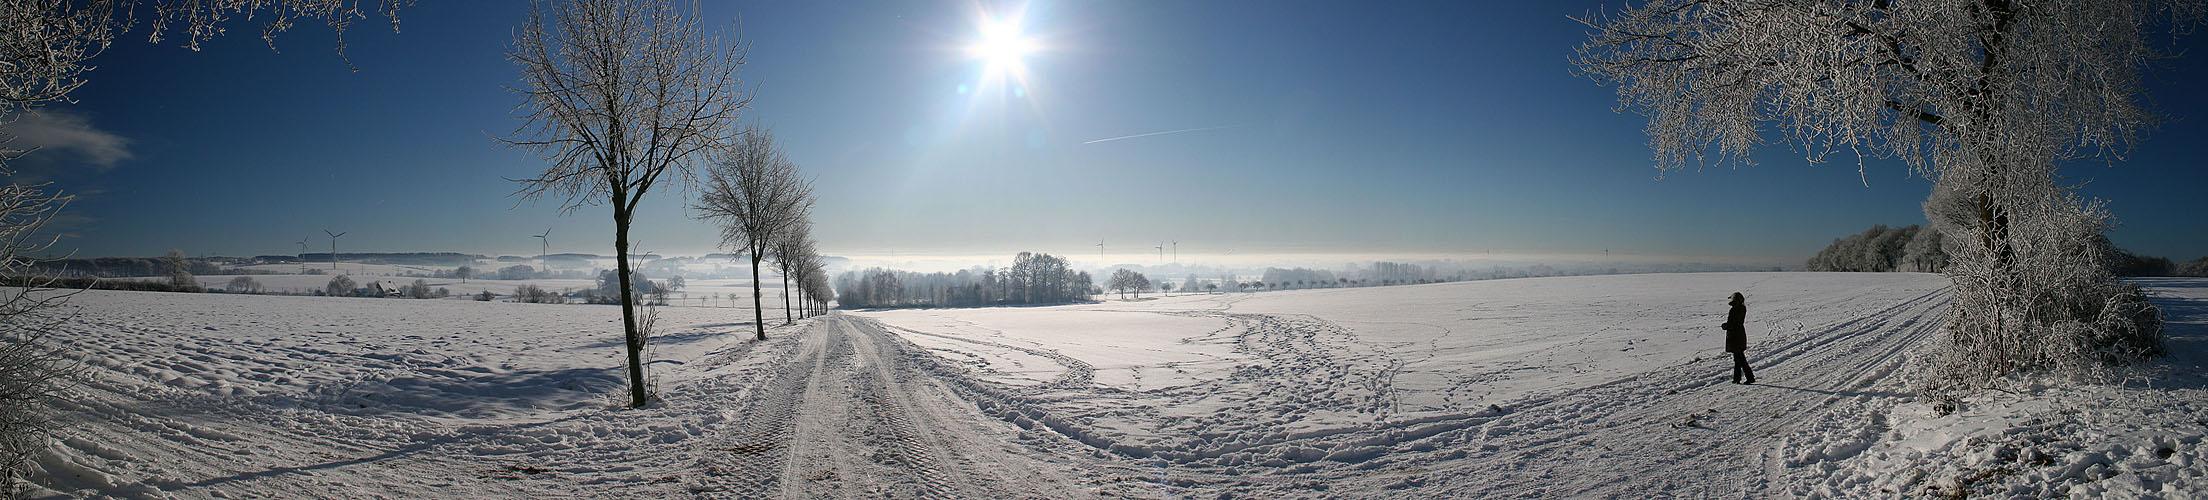 Panorama Coesfelder Berg